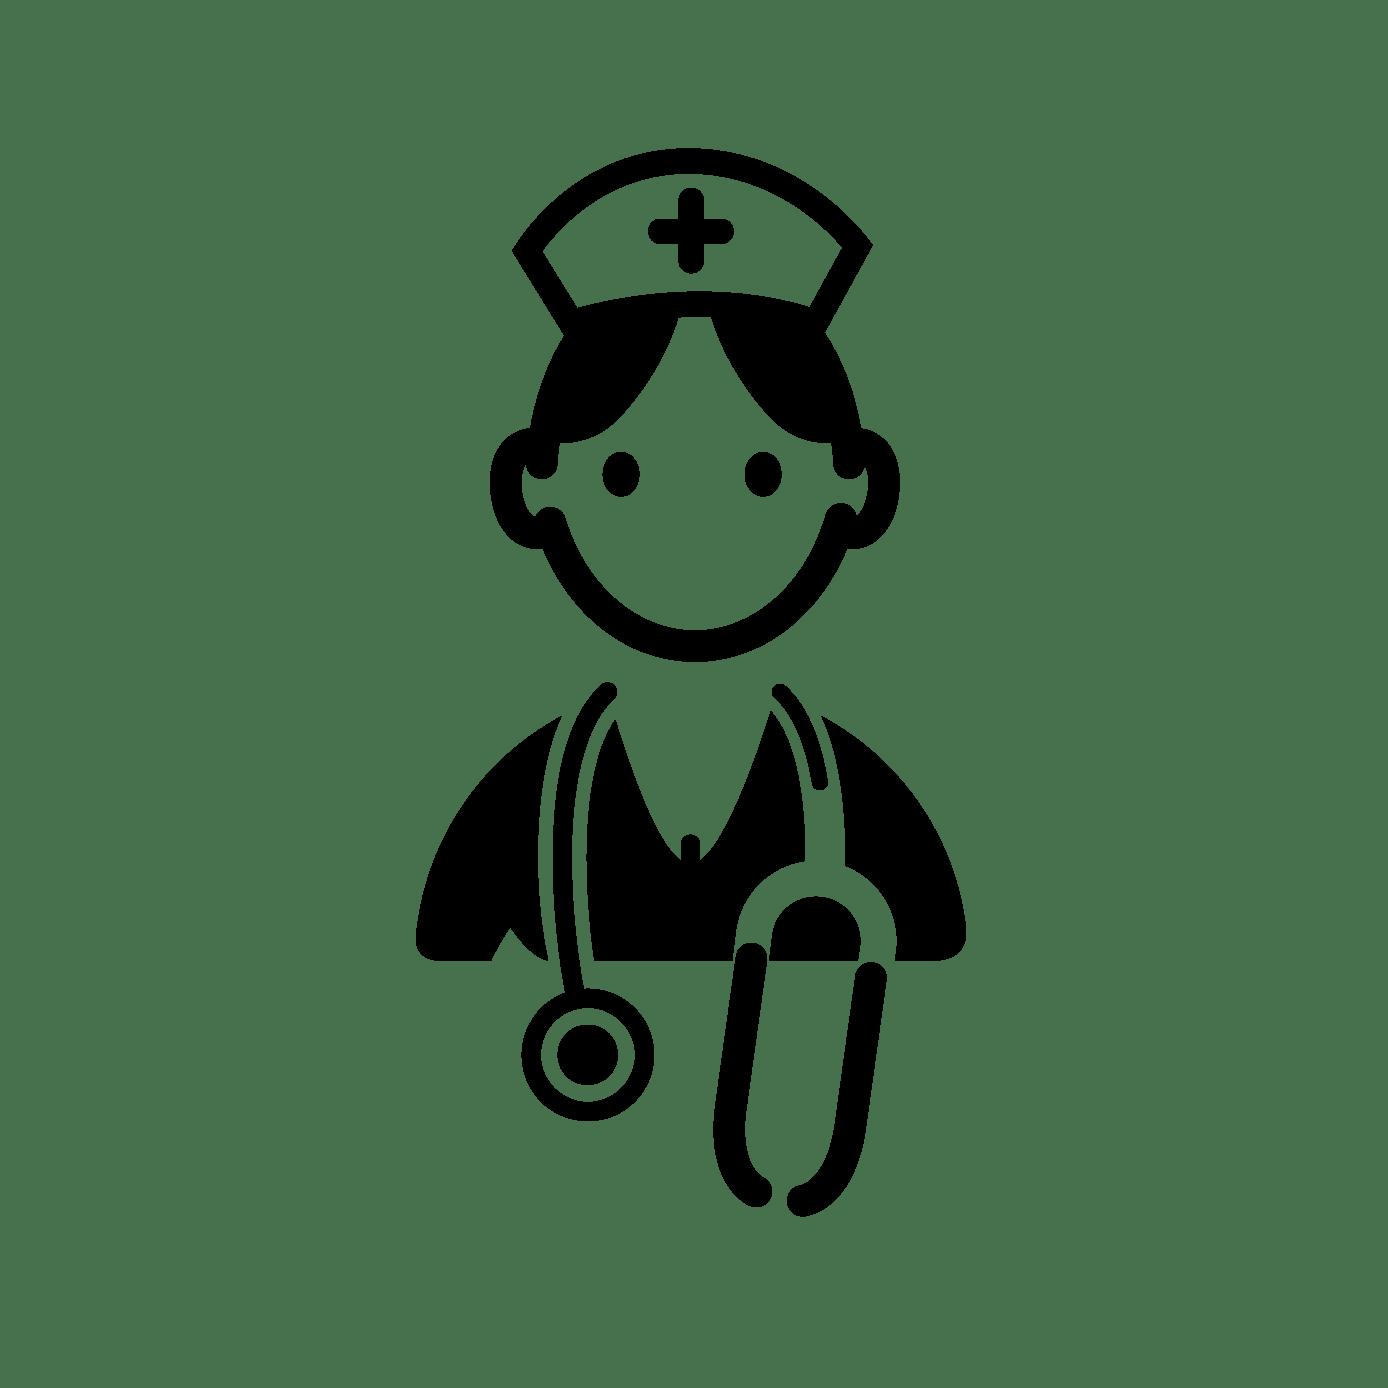 Nursing Home Clipart